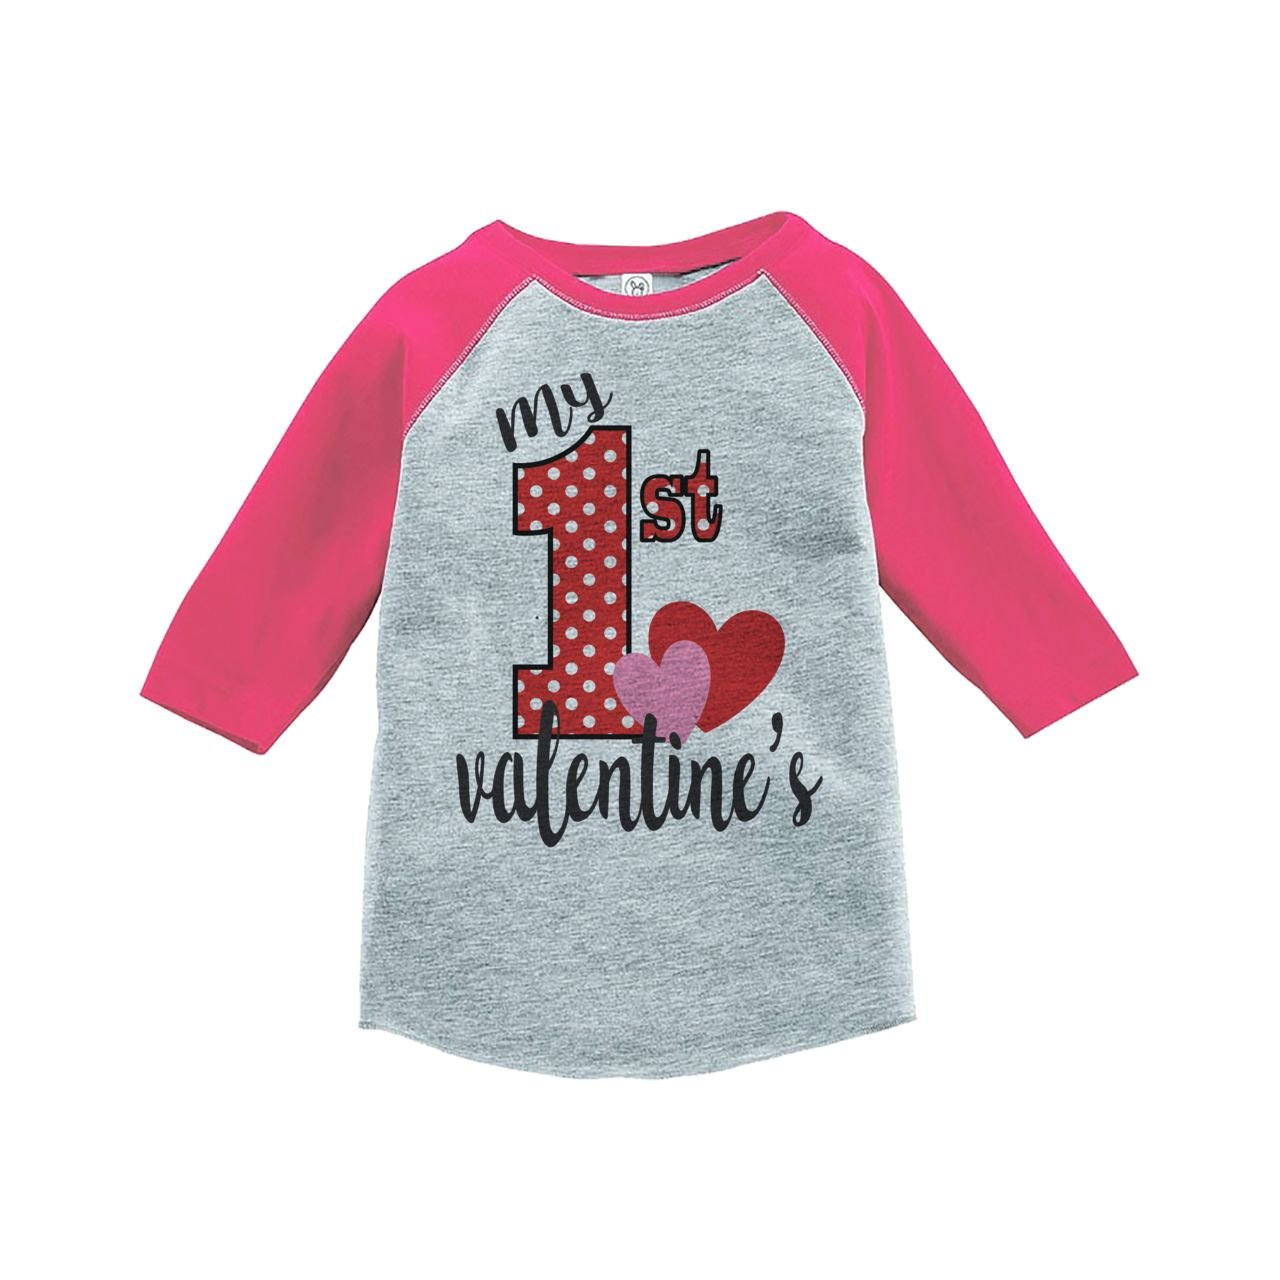 Custom Party Shop Girls My 1st Valentines T-shirt